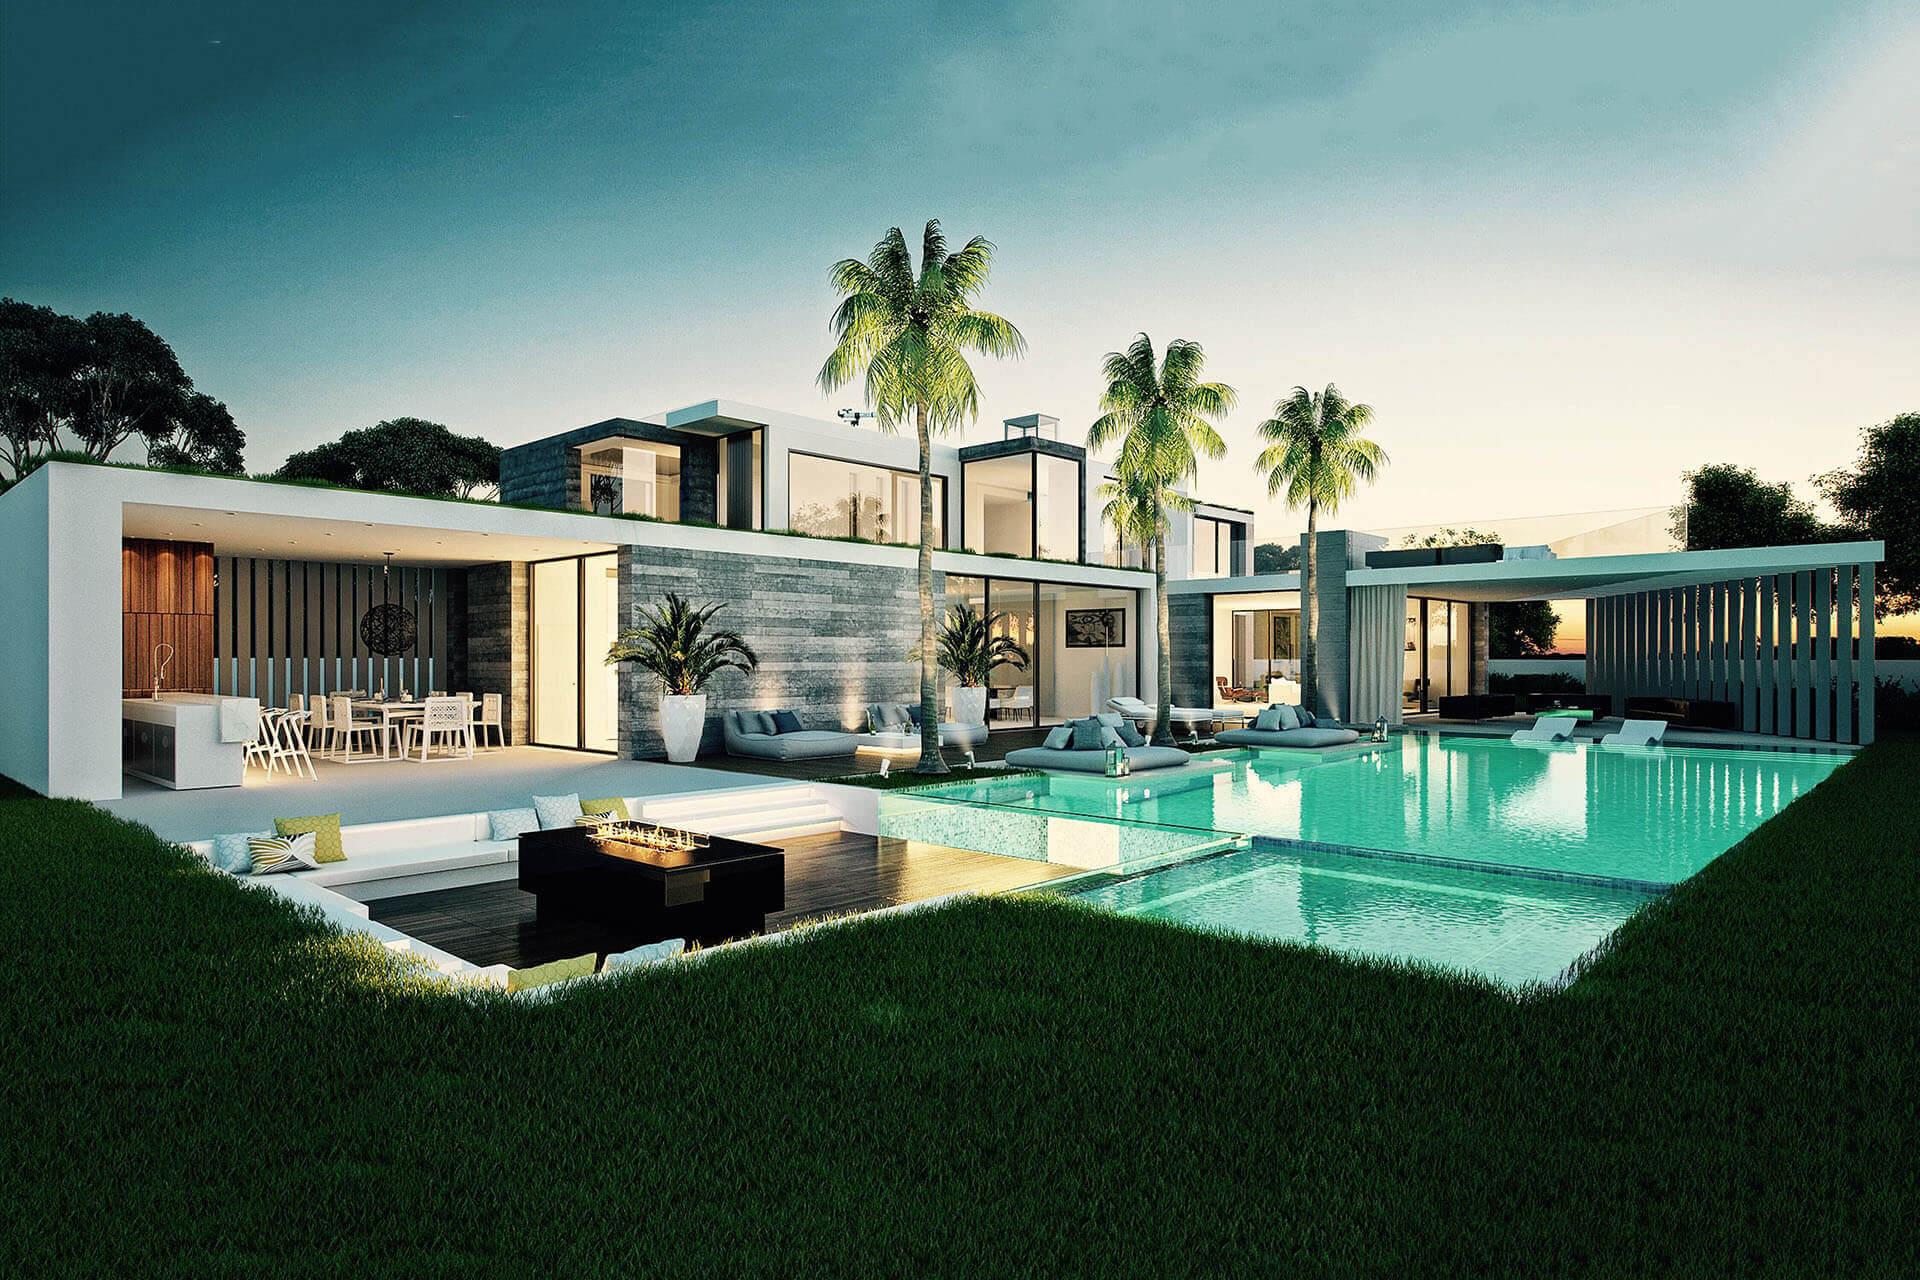 Villa Juste - archidomstudio.com